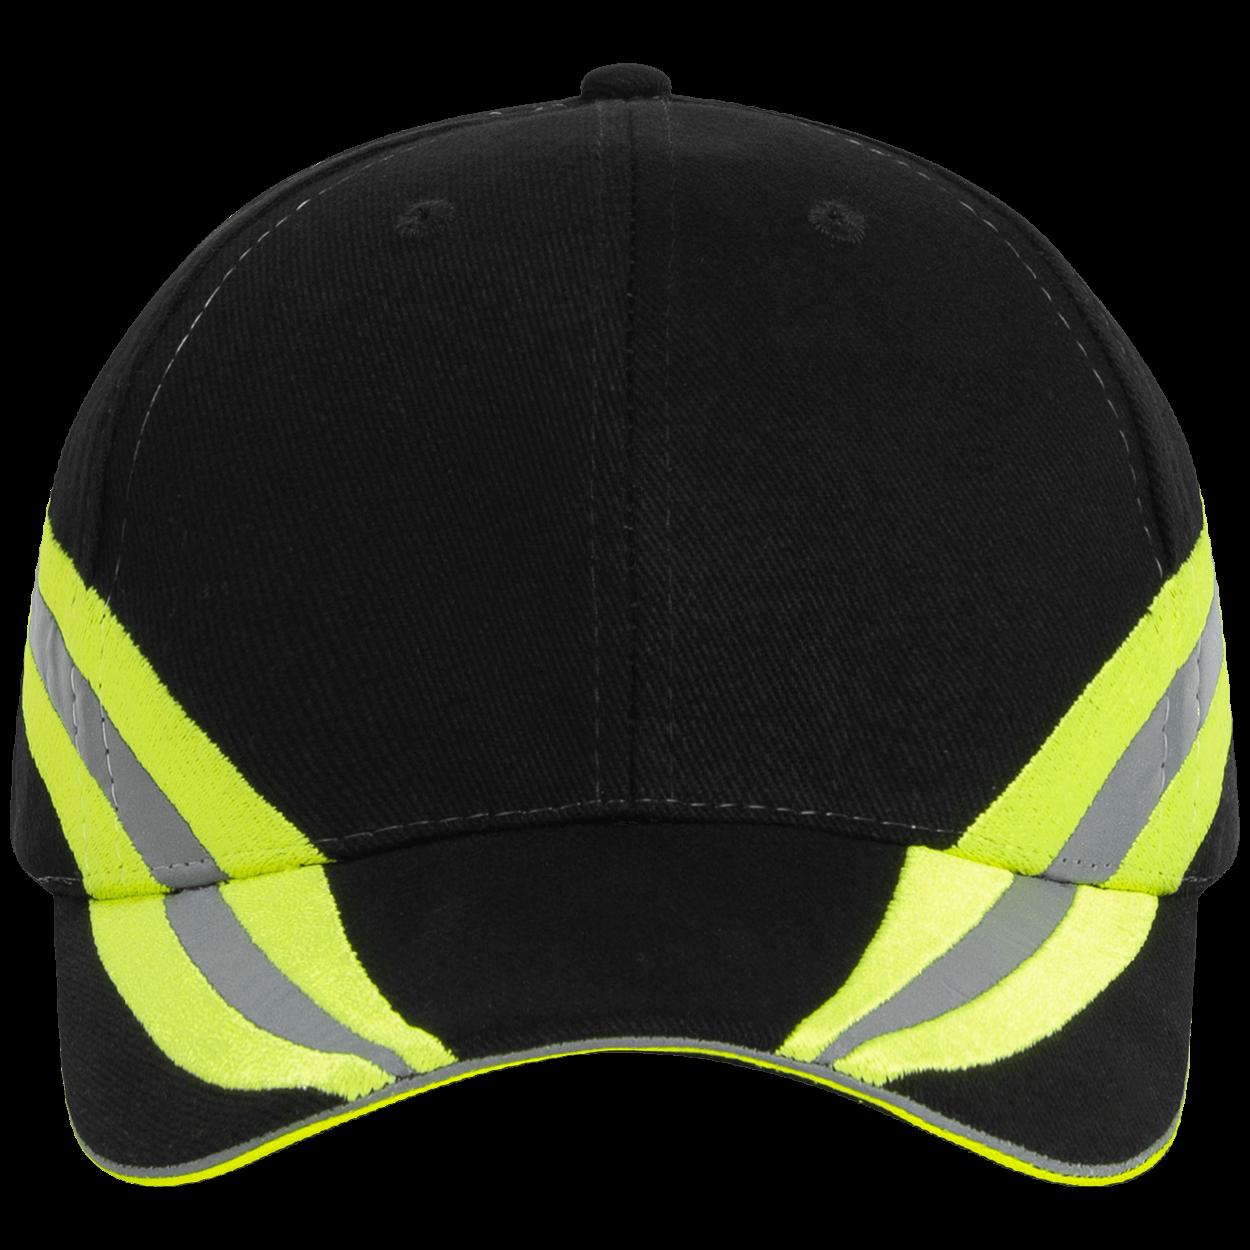 Feuerwehr Basecap schwarz